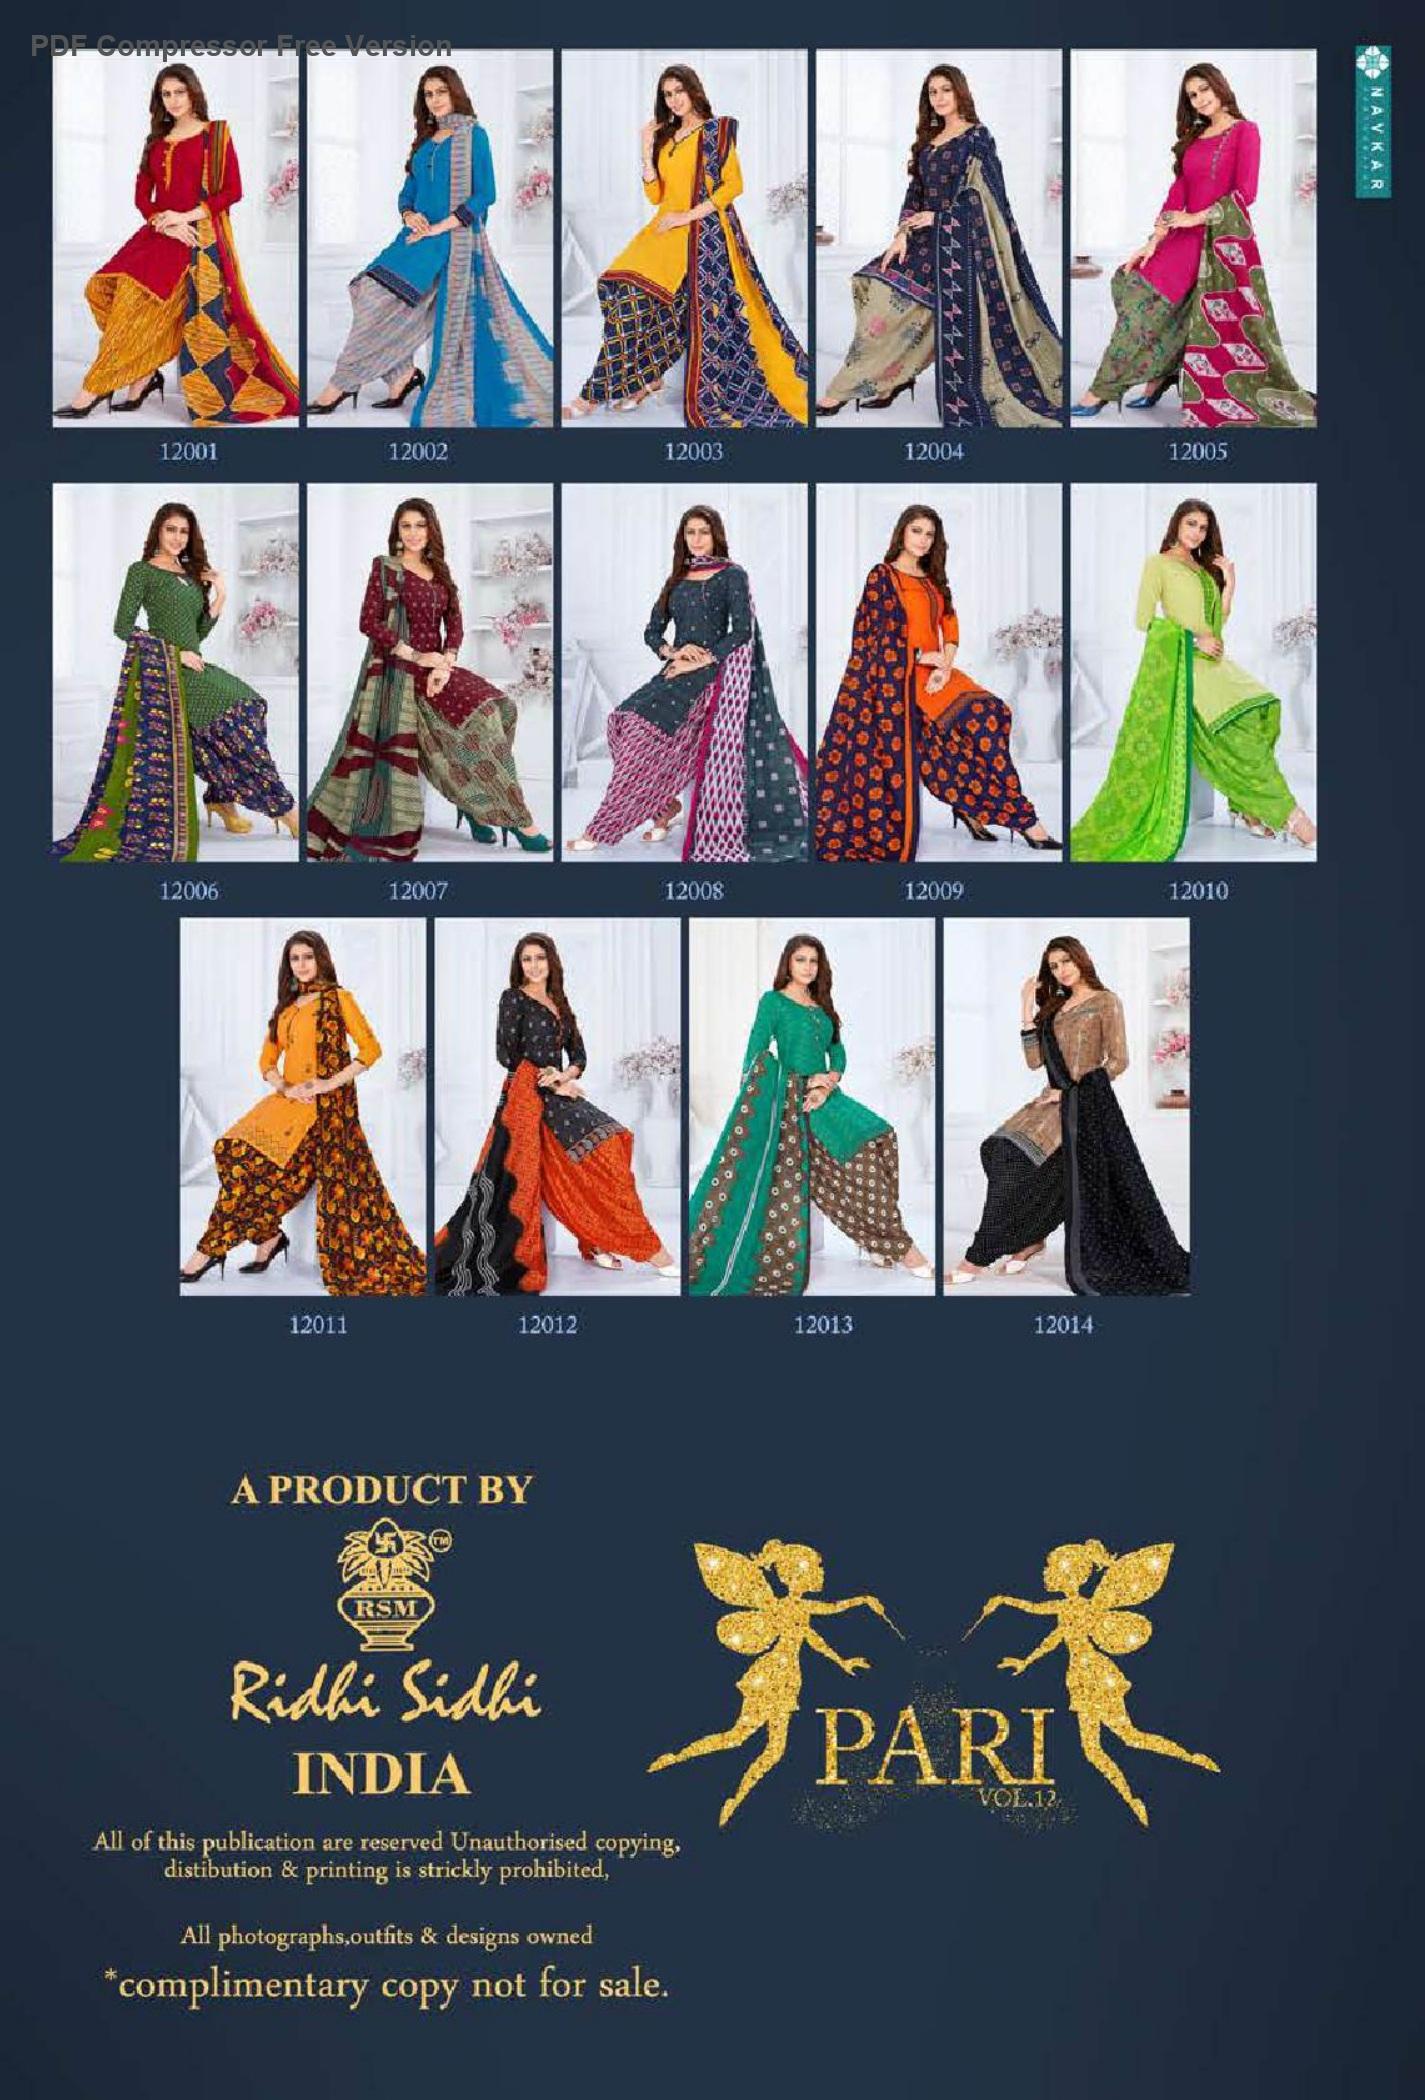 Ridhi-Sidhi-Pari-Vol-12-16